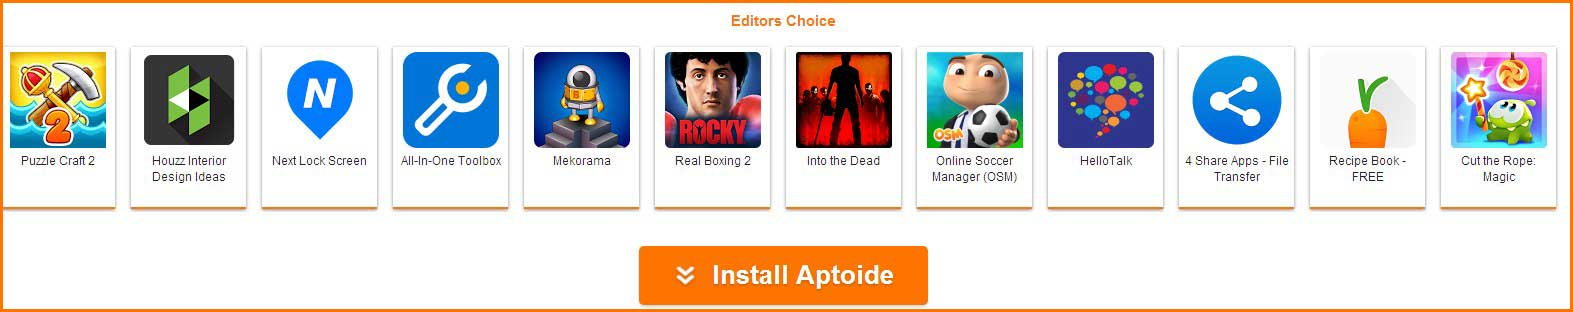 aptoide-apps-list